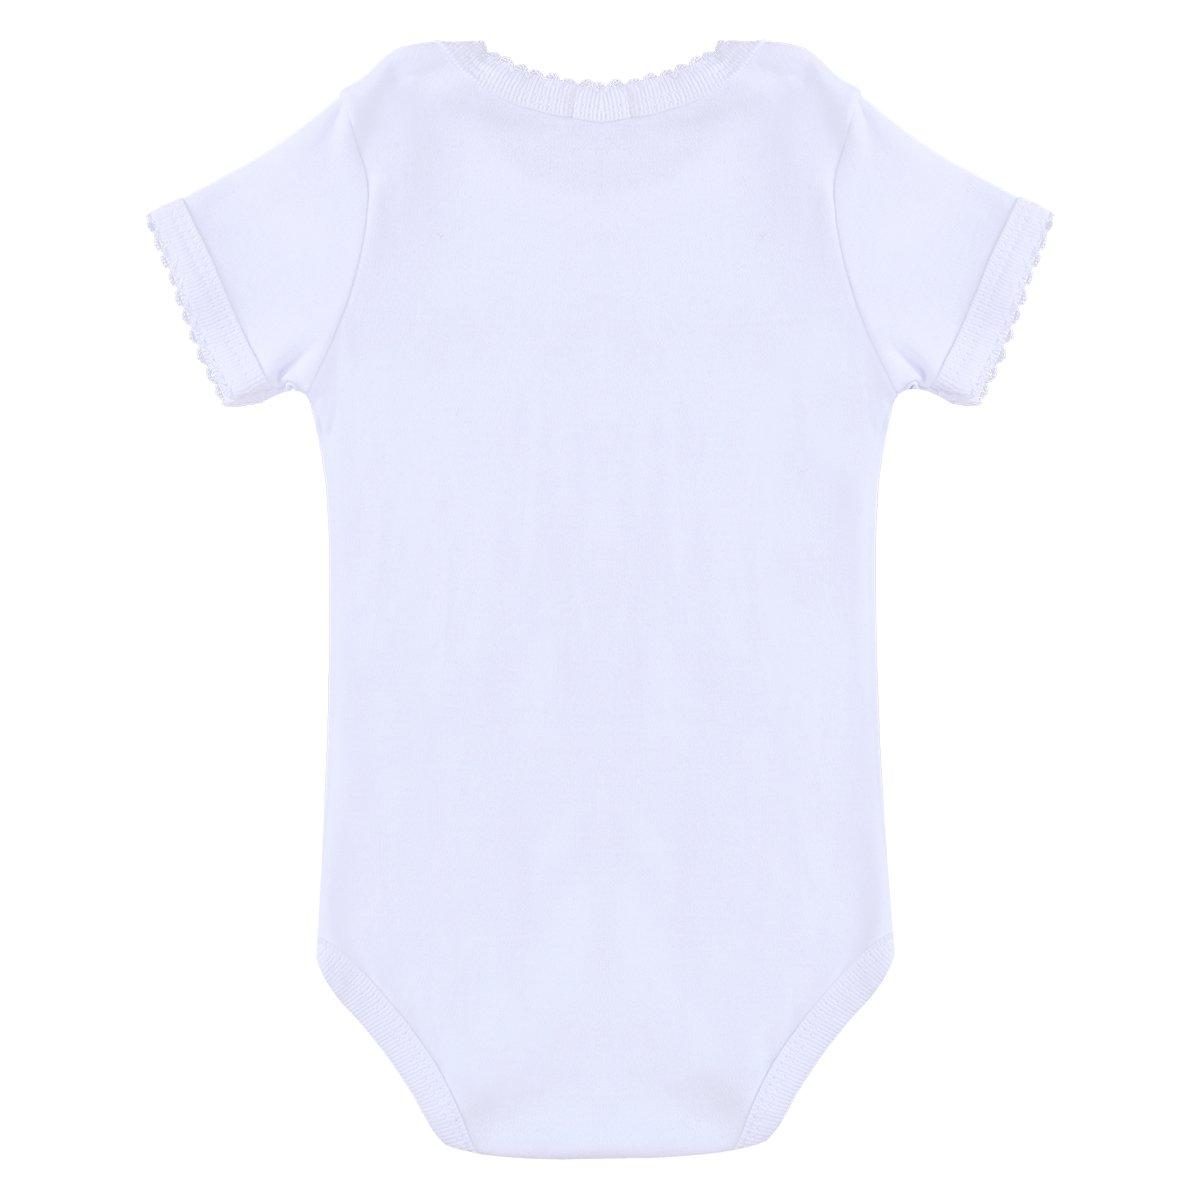 Newborn Infant Baby Girl My 1st Halloween Outfits Romper Jumpsuit Bodysuit Tops Tutu Skirt Headband Leg Warmers Clothes